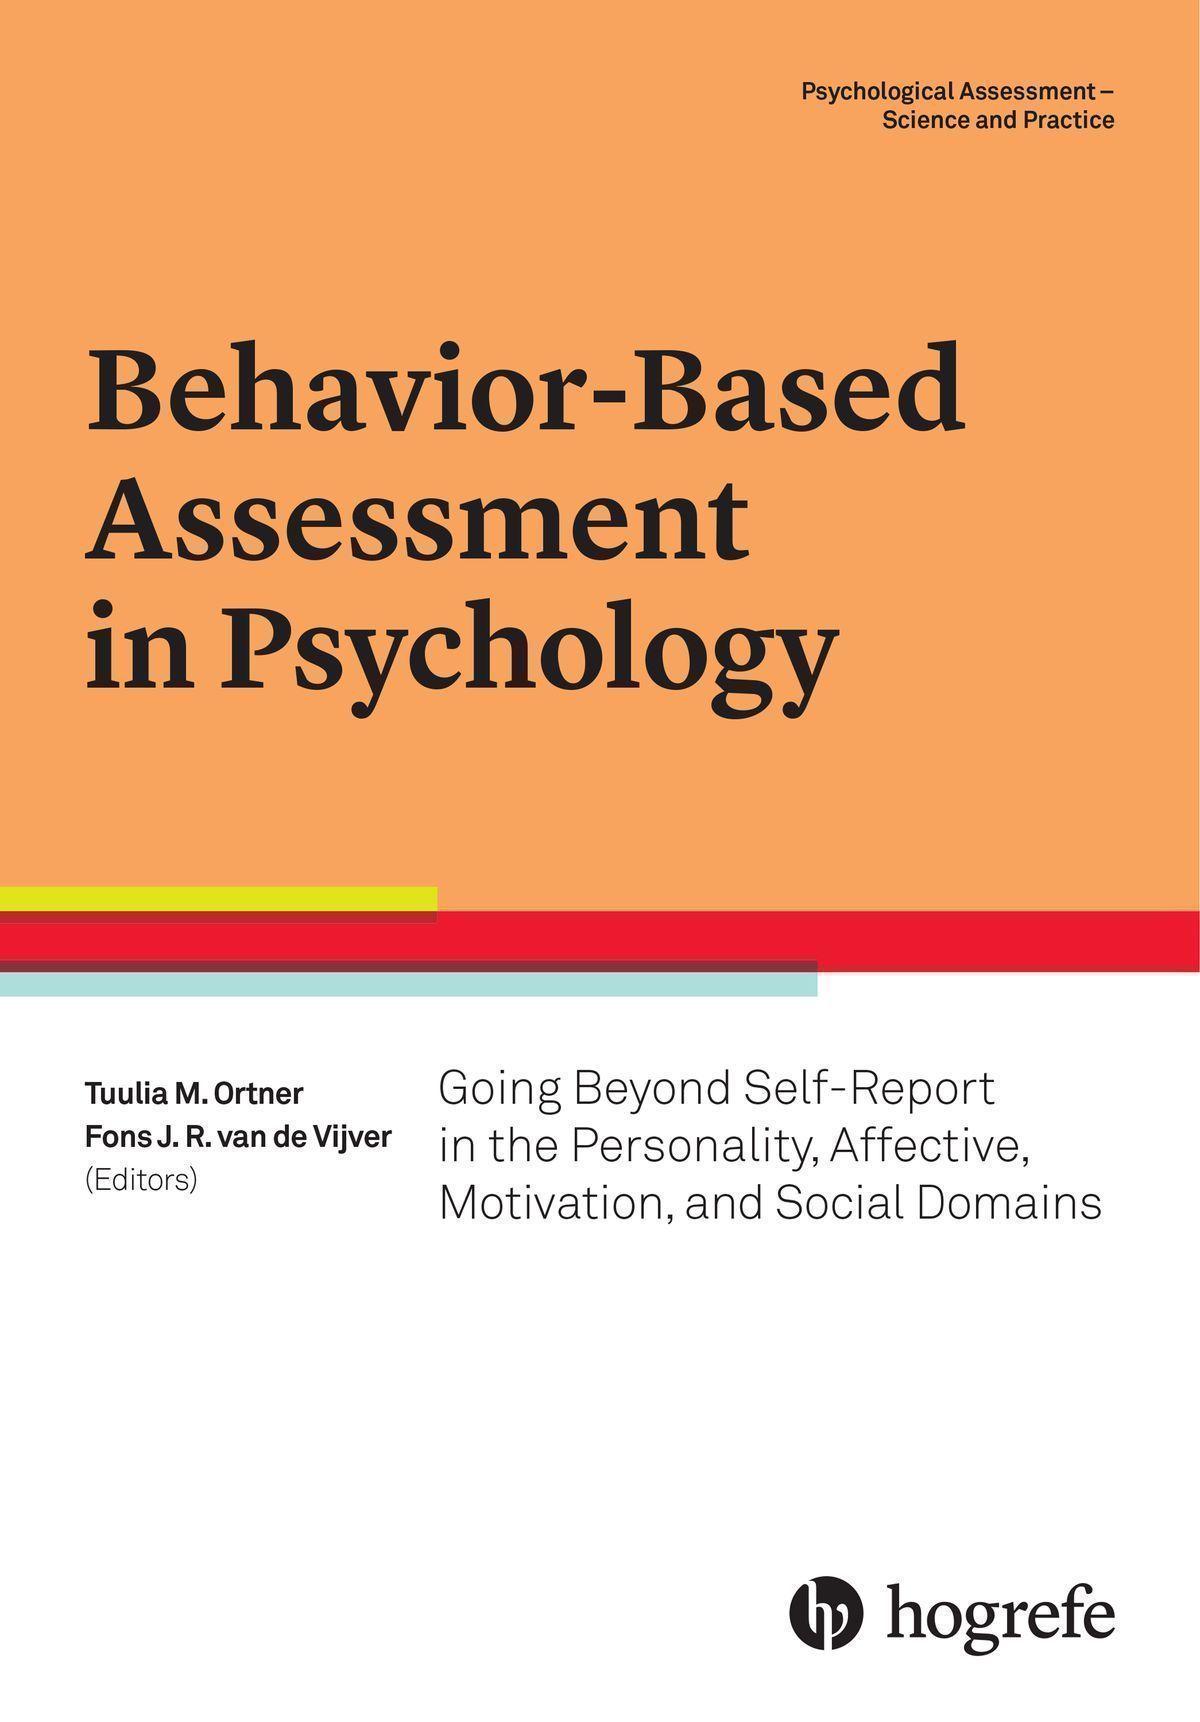 Behavior-Based Assessment in Psychology